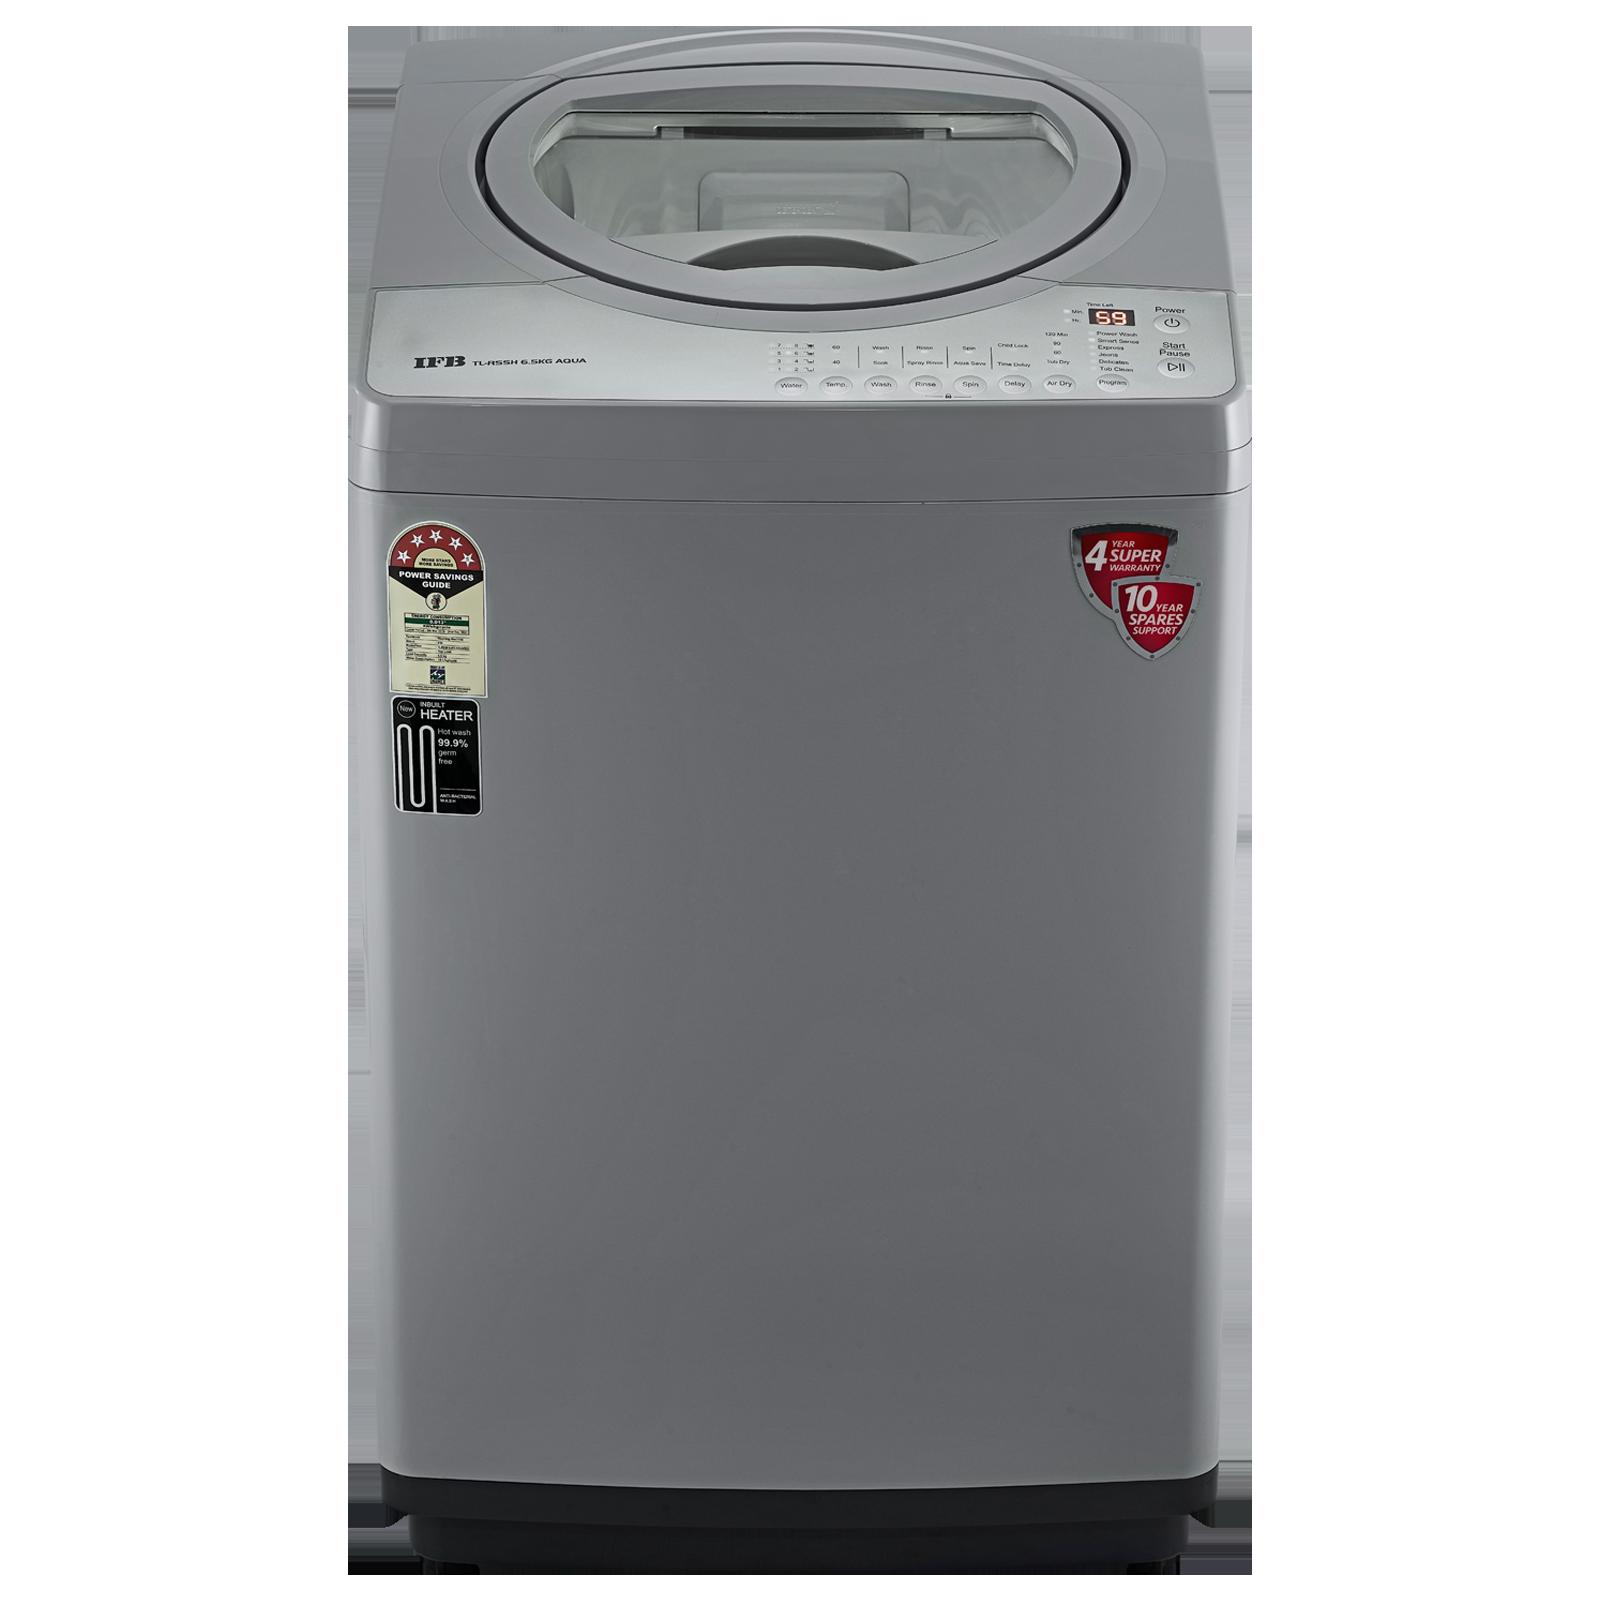 IFB Aqua 6.5 kg 5 Star Fully Automatic Top Load Washing Machine (Built-In Heater, TL-RSSH, PCM - Light Grey)_1